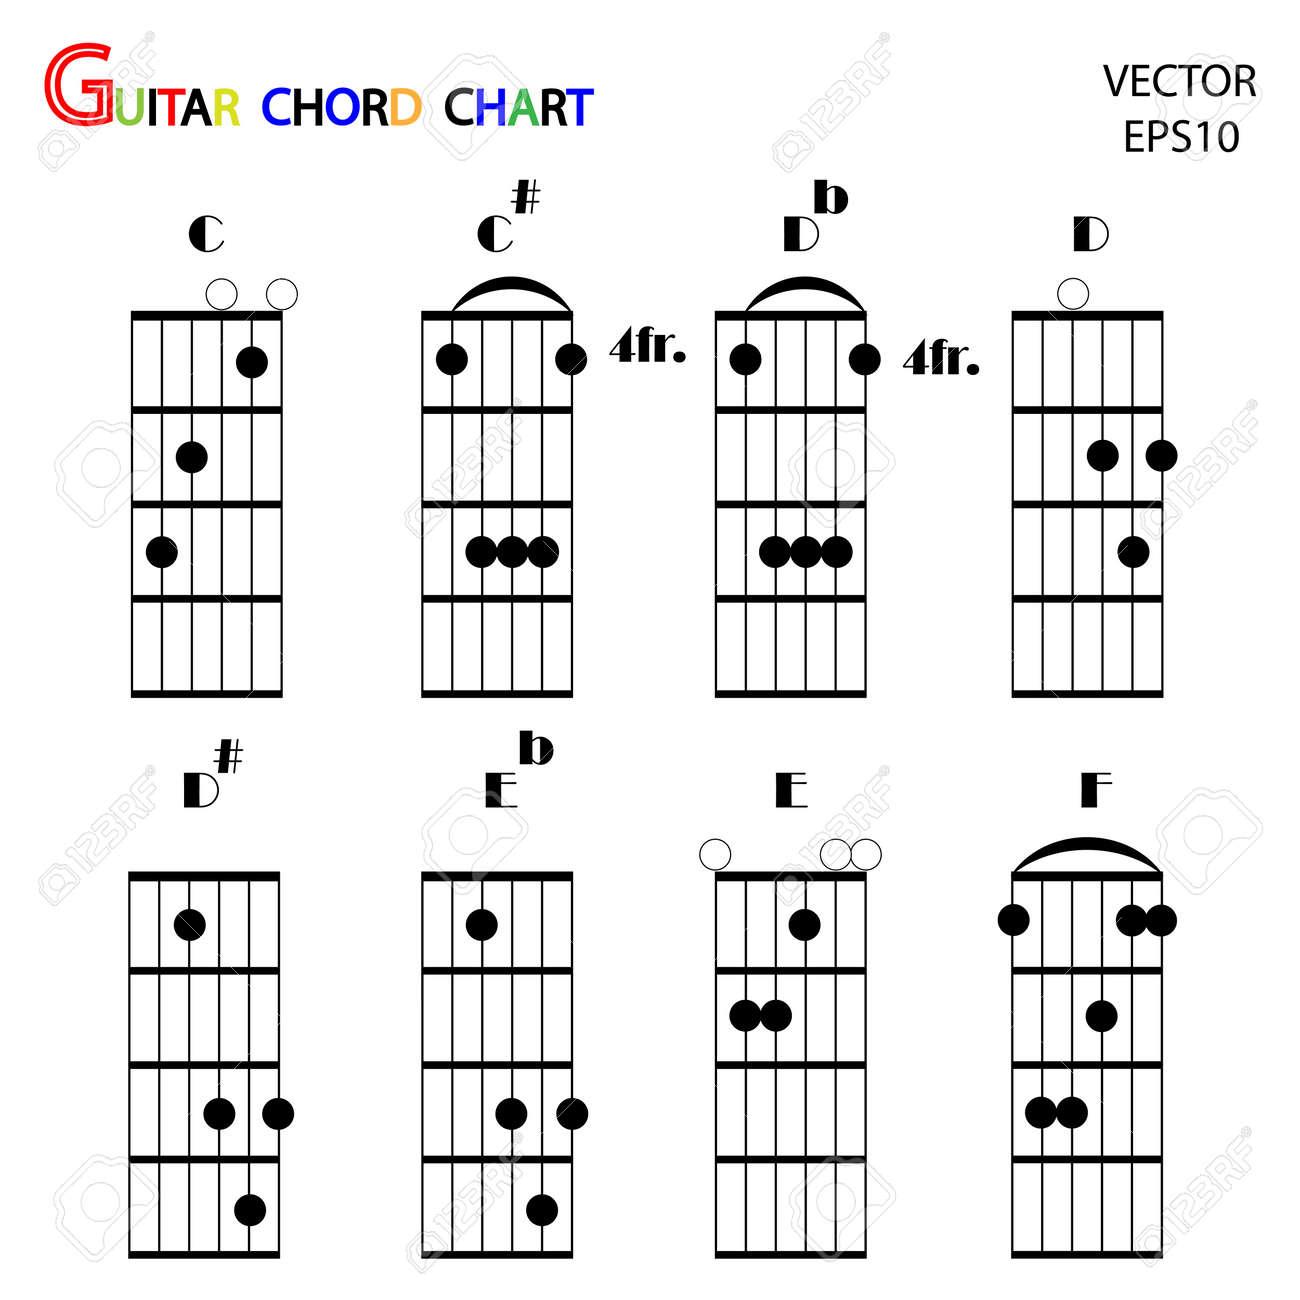 Basic guitar chords tab guitar chordsvector royalty free basic guitar chords tab guitar chordsvector stock vector 18165377 hexwebz Image collections